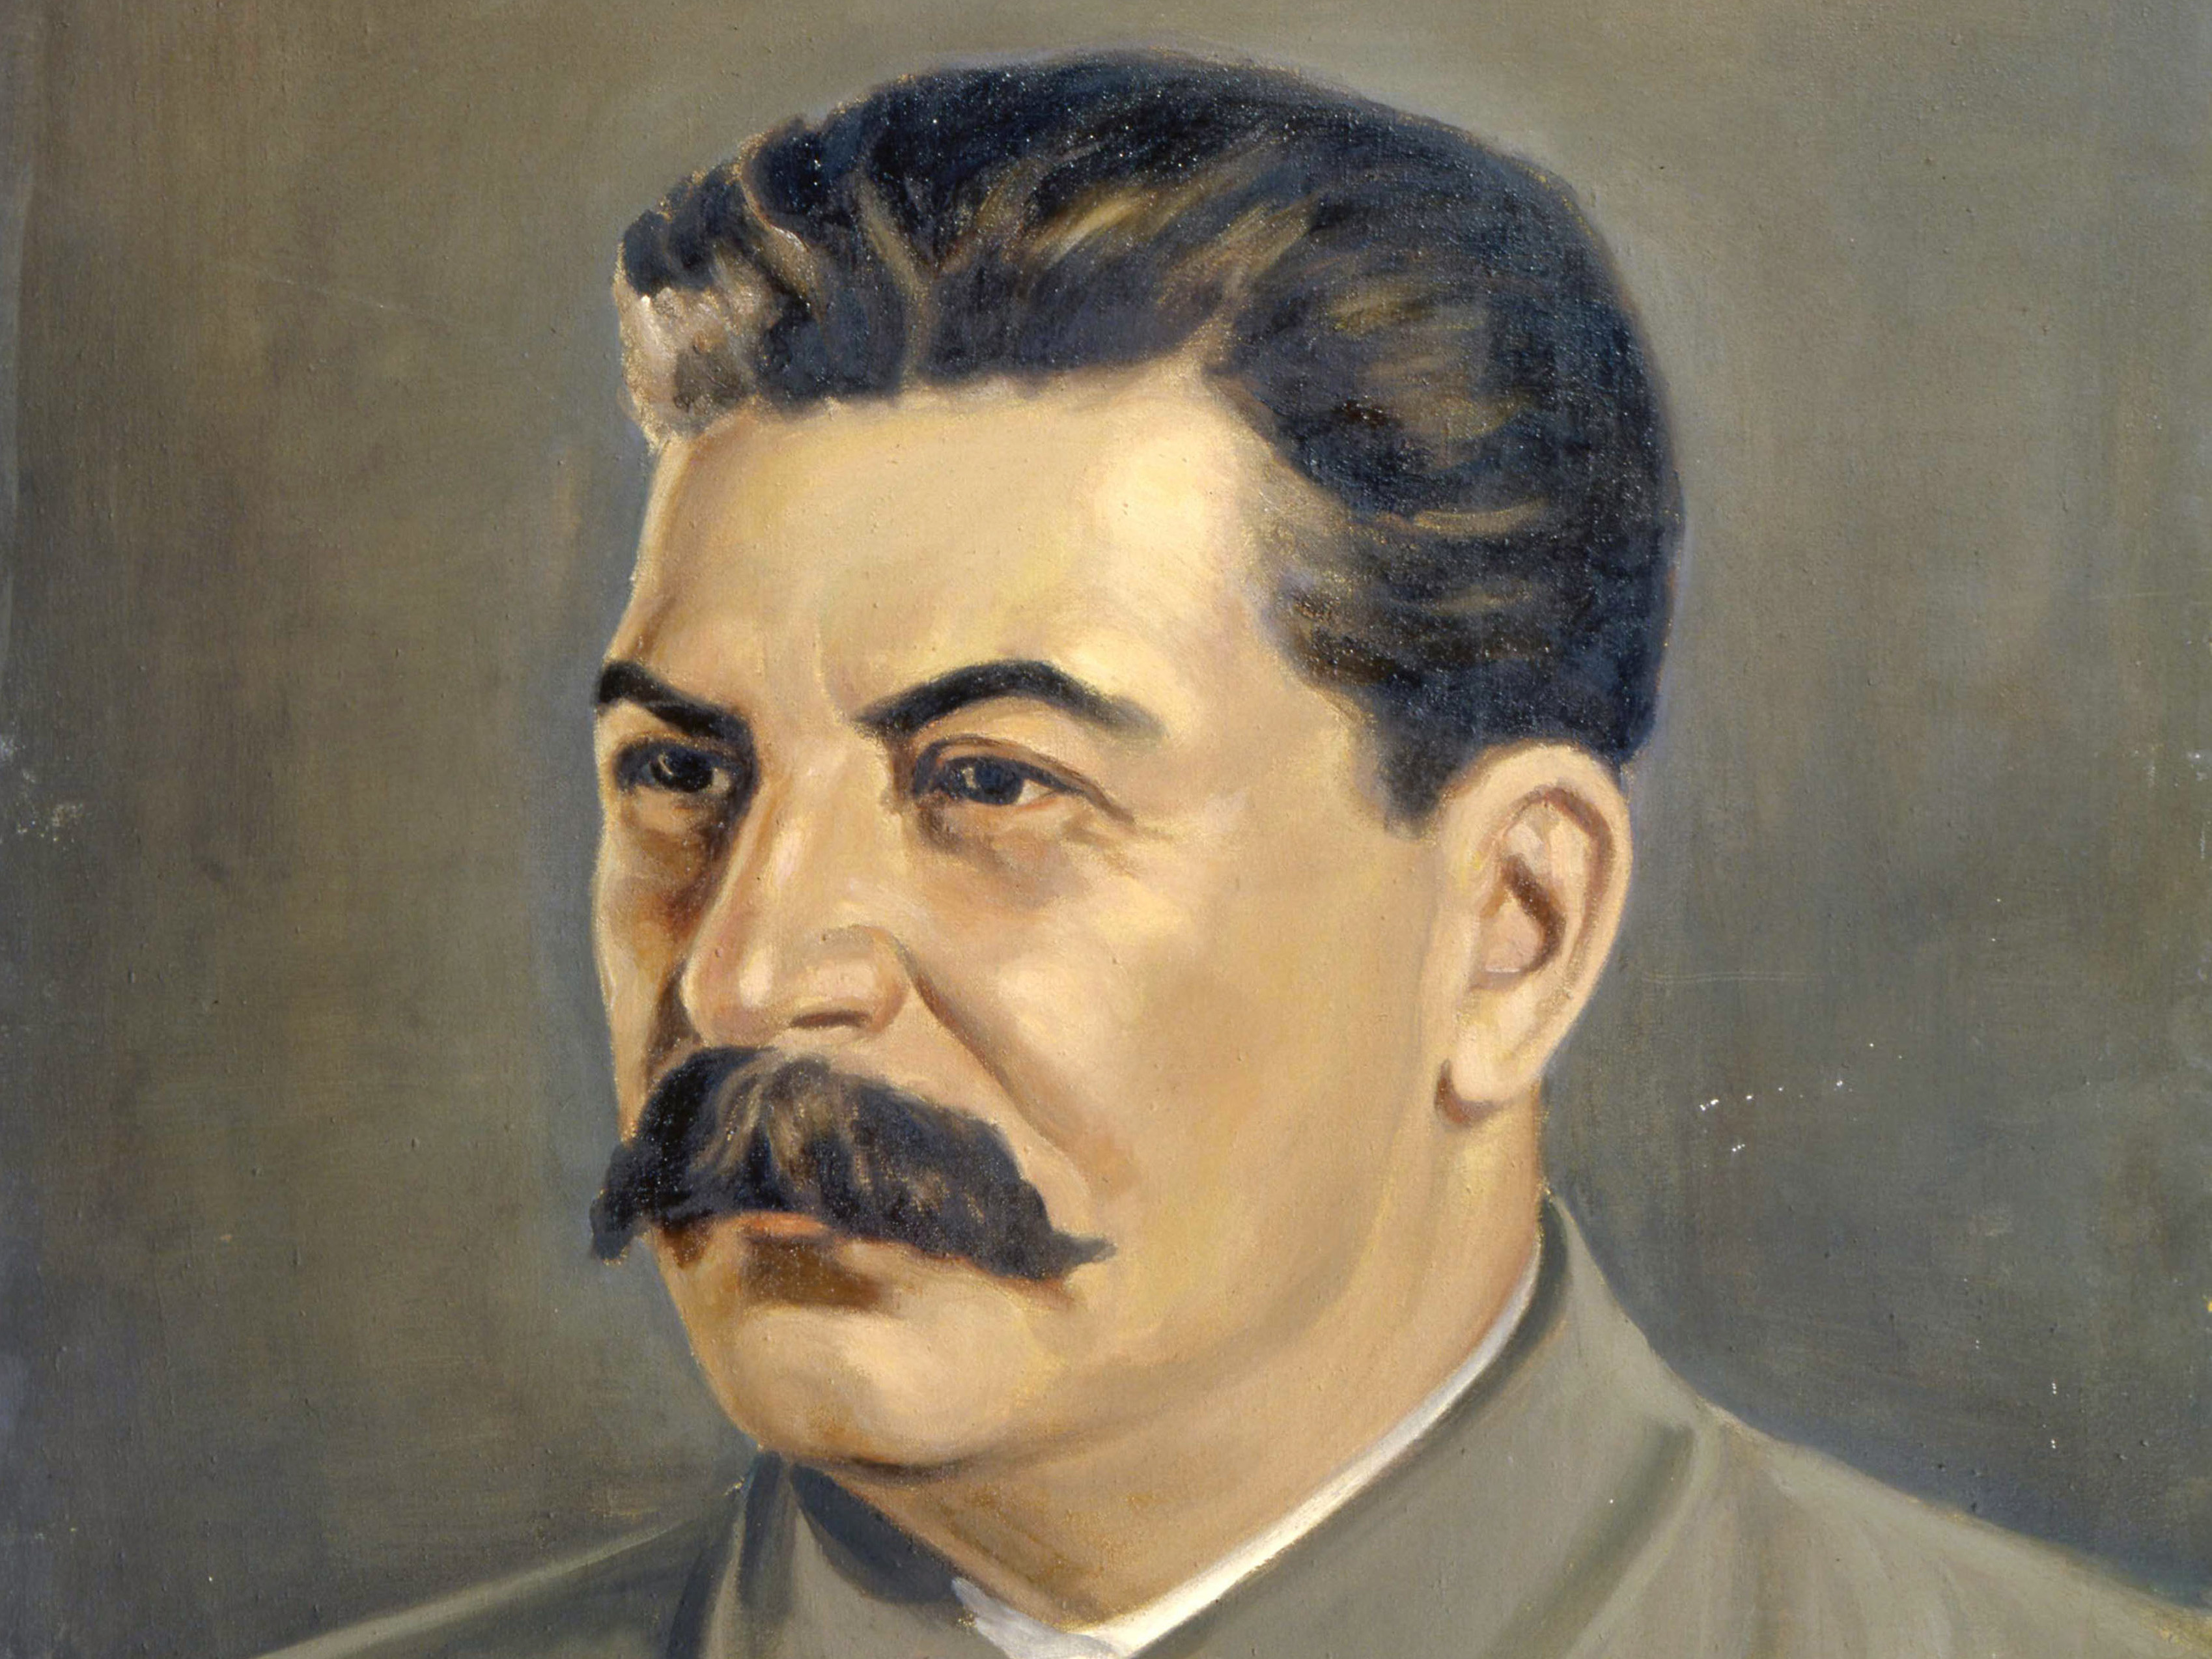 Painting of Joseph Stalin